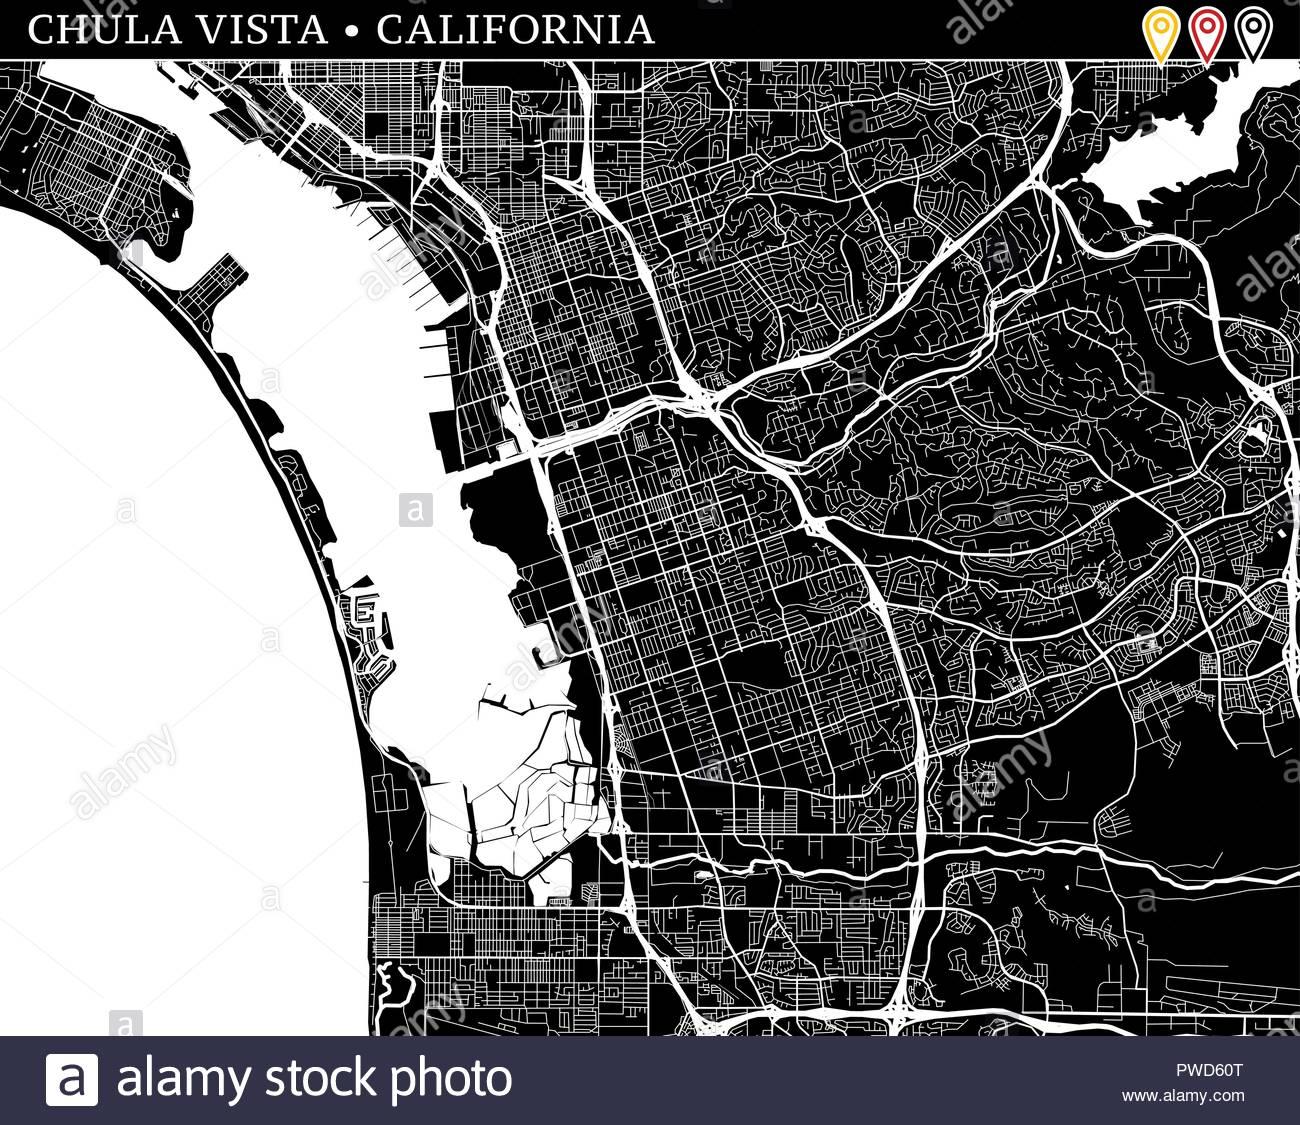 Simple map of Chula Vista California USA Black and white 1300x1125